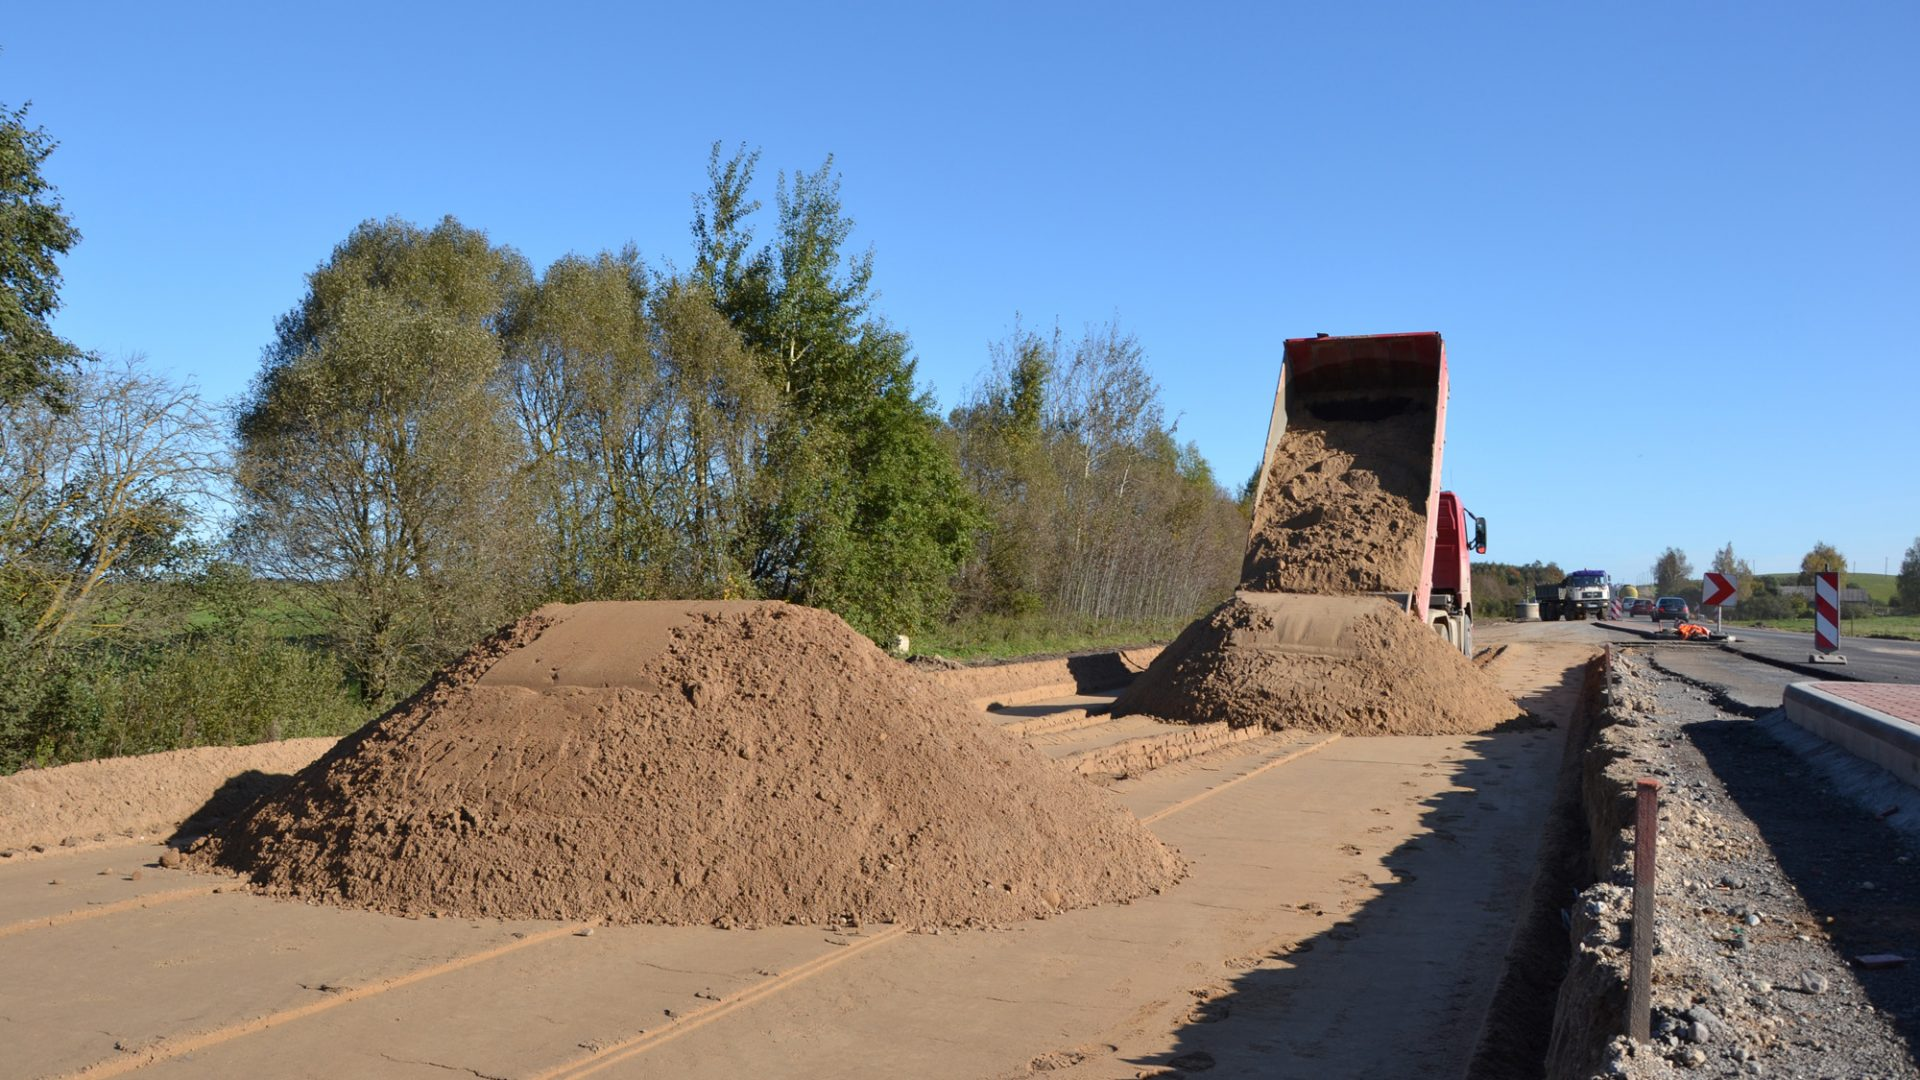 stockvault-sand-piles141890